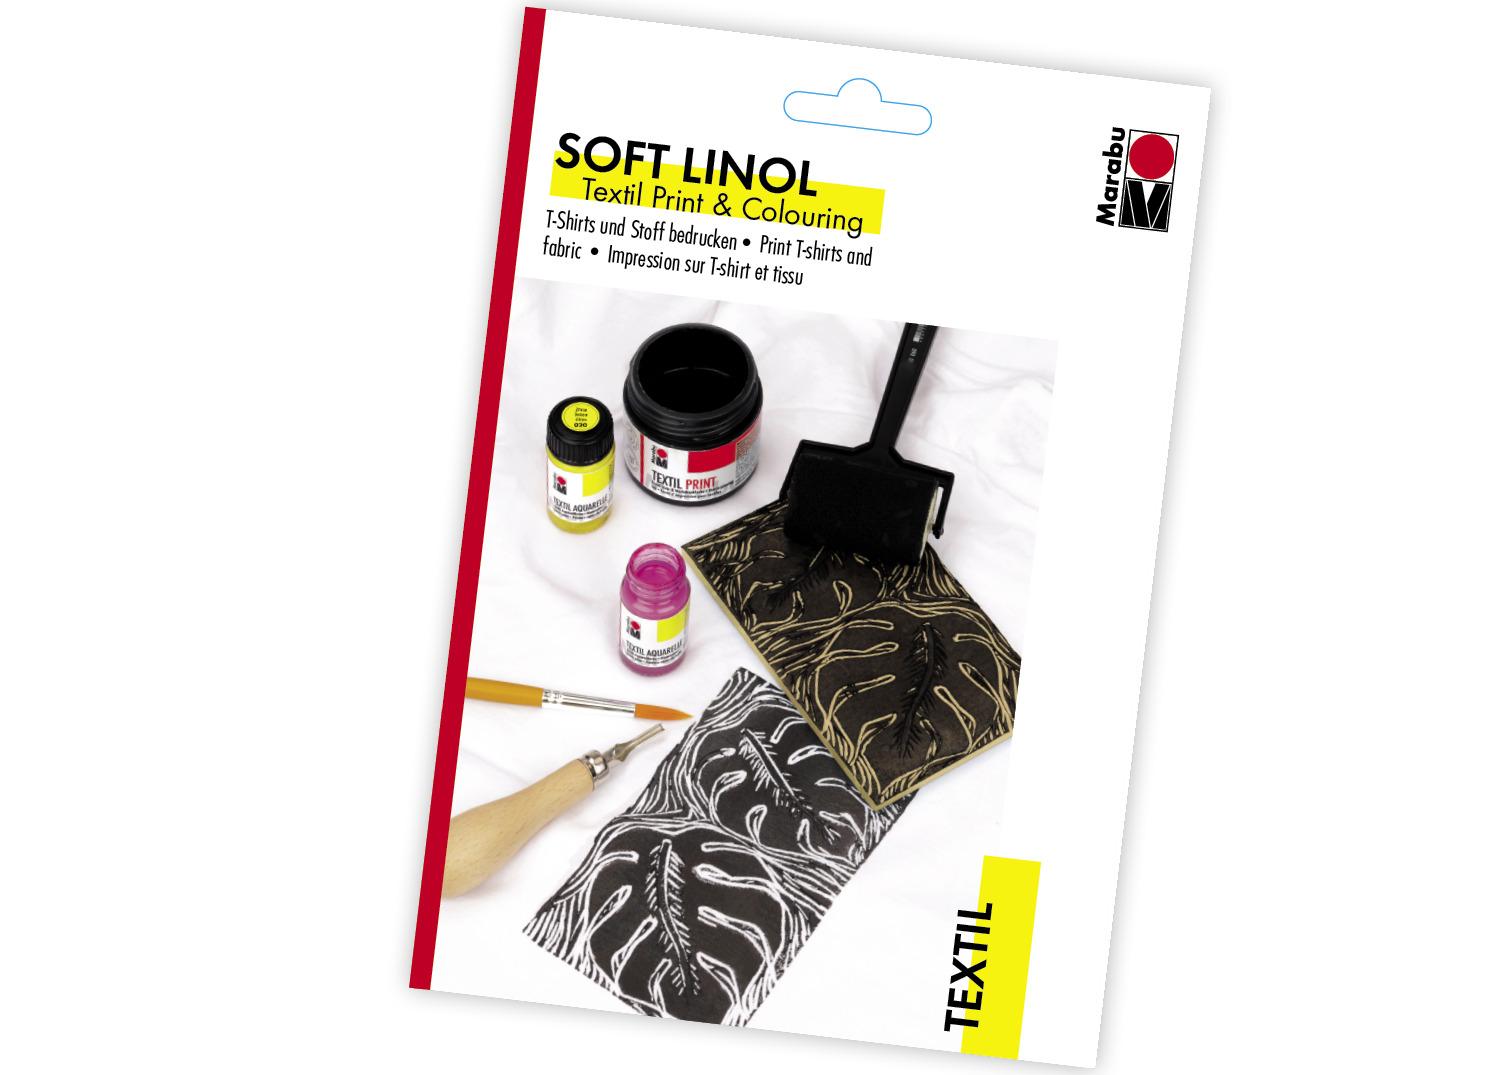 Marabu-Textil-Print-Colouring-Soft-Linol-Title.jpg